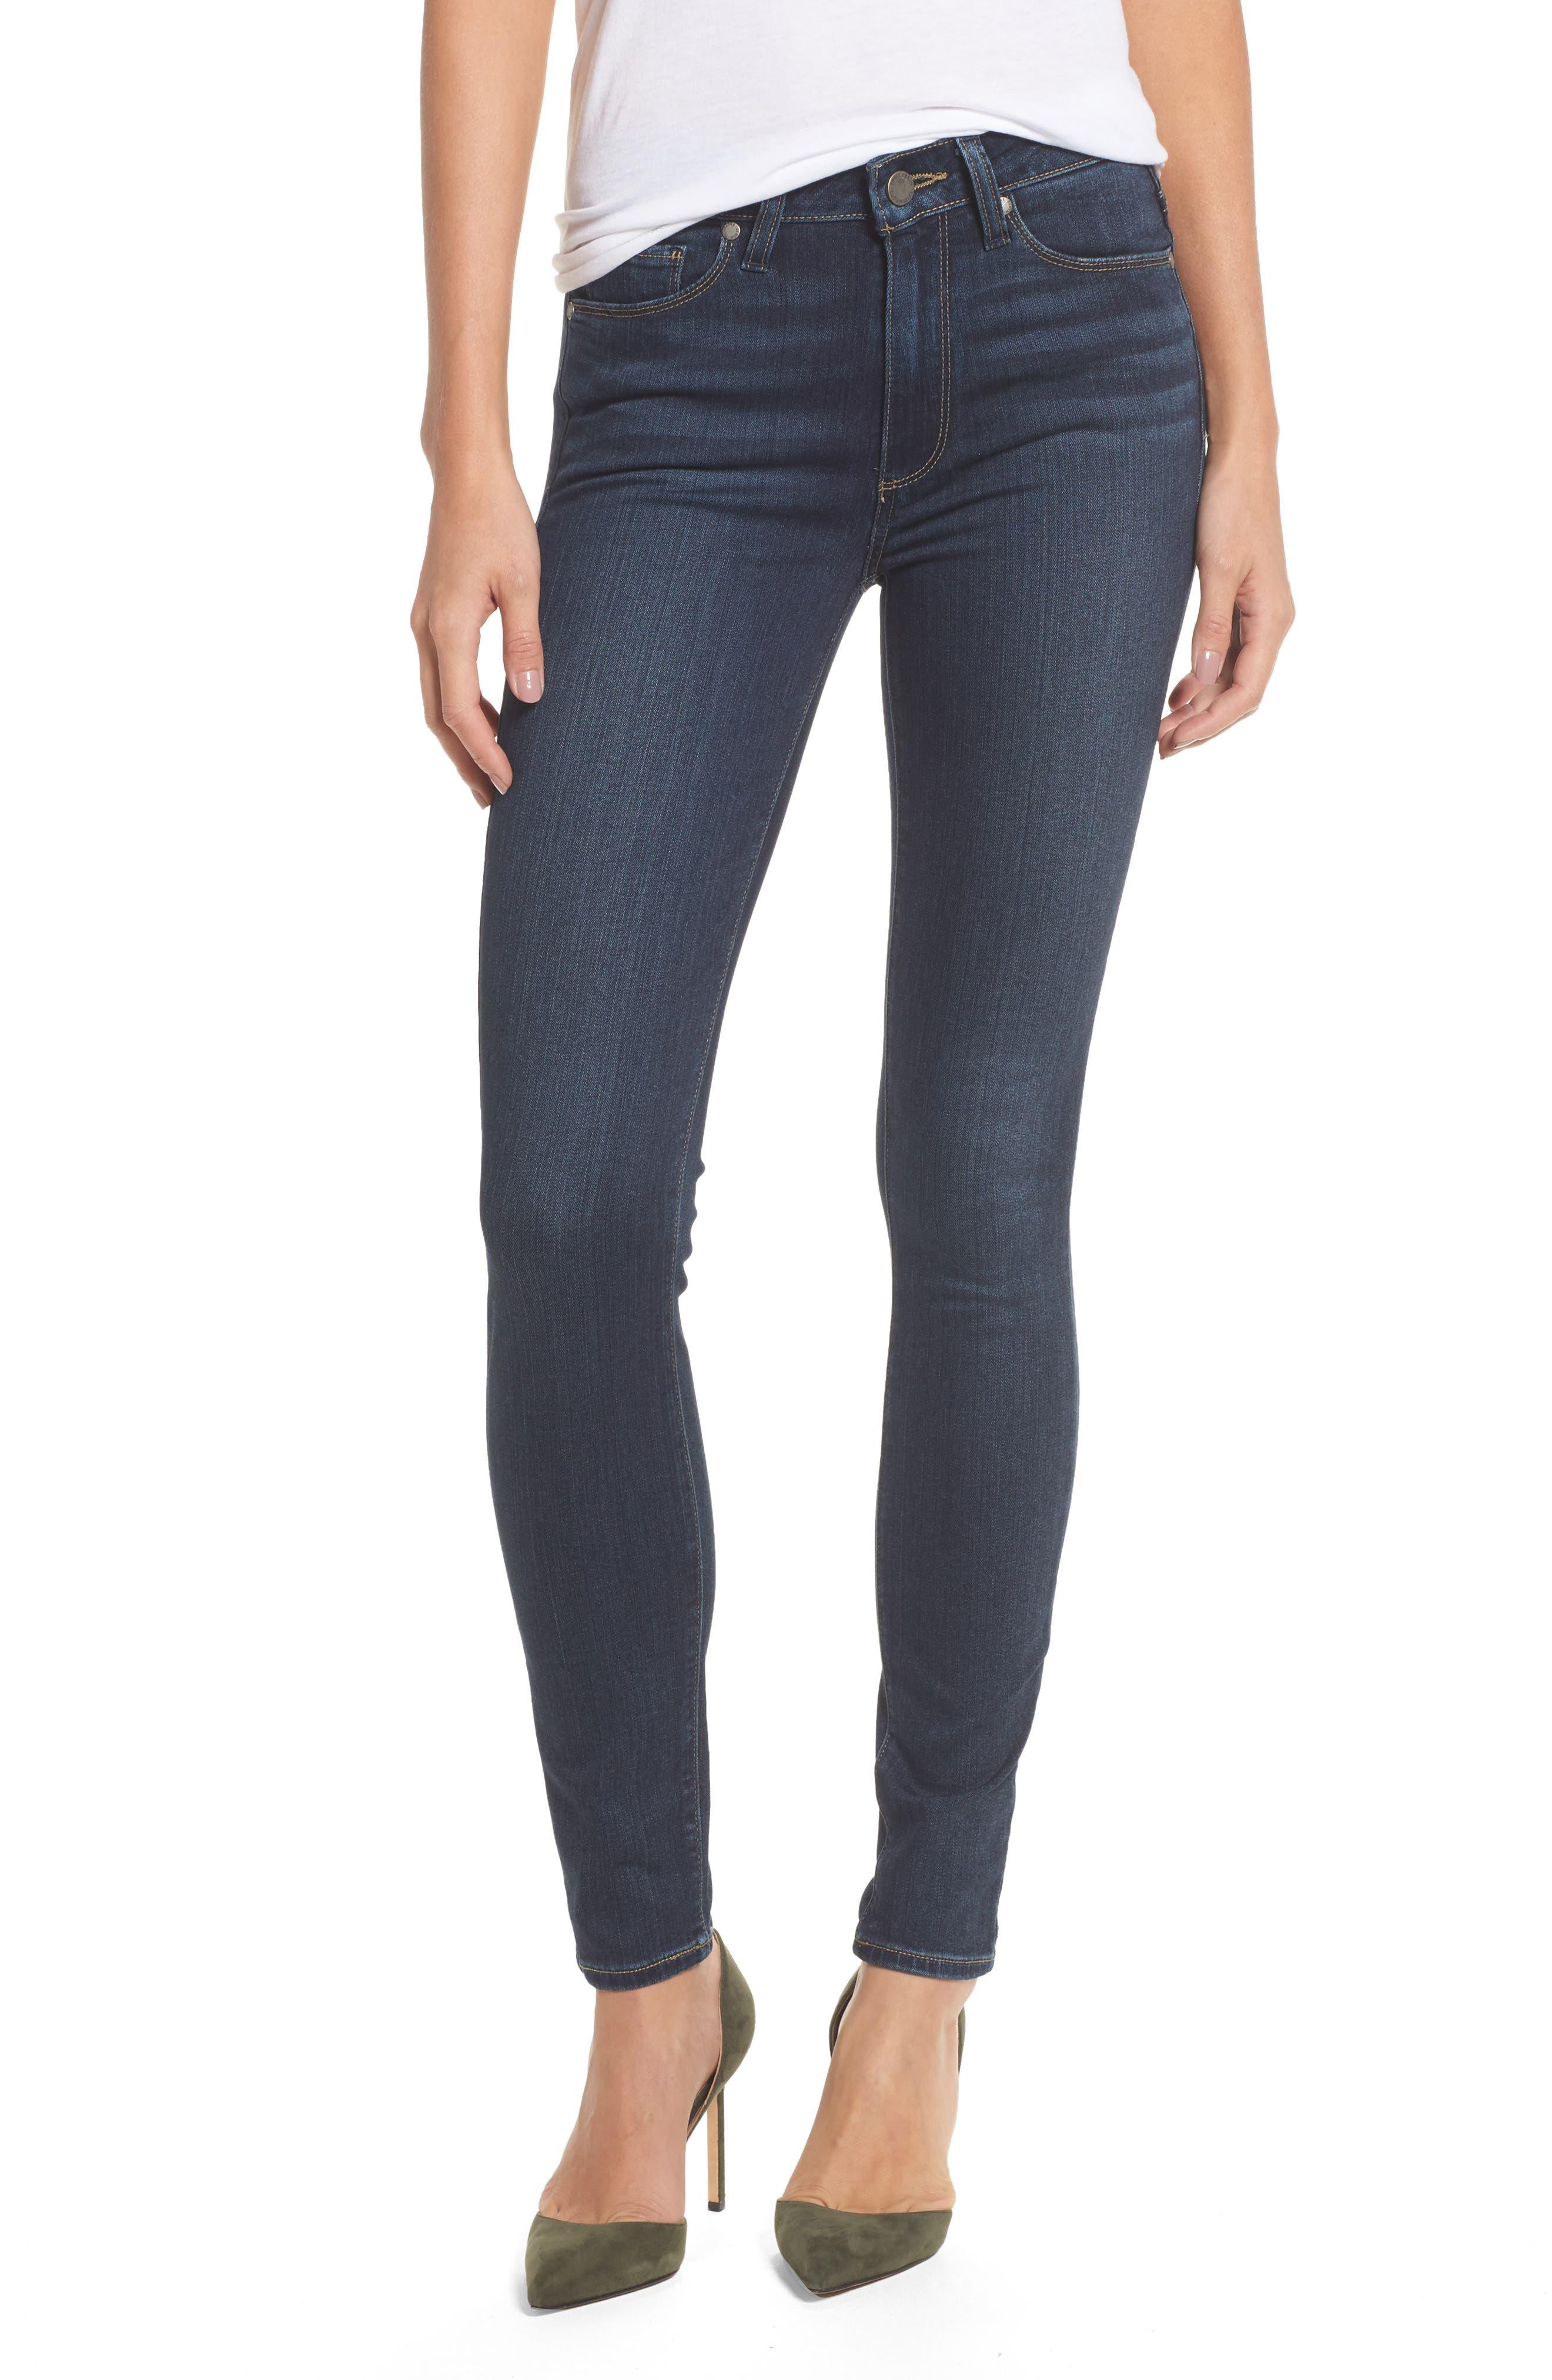 Transcend - Hoxton High Waist Ultra Skinny Jeans,                             Main thumbnail 1, color,                             Nottingham